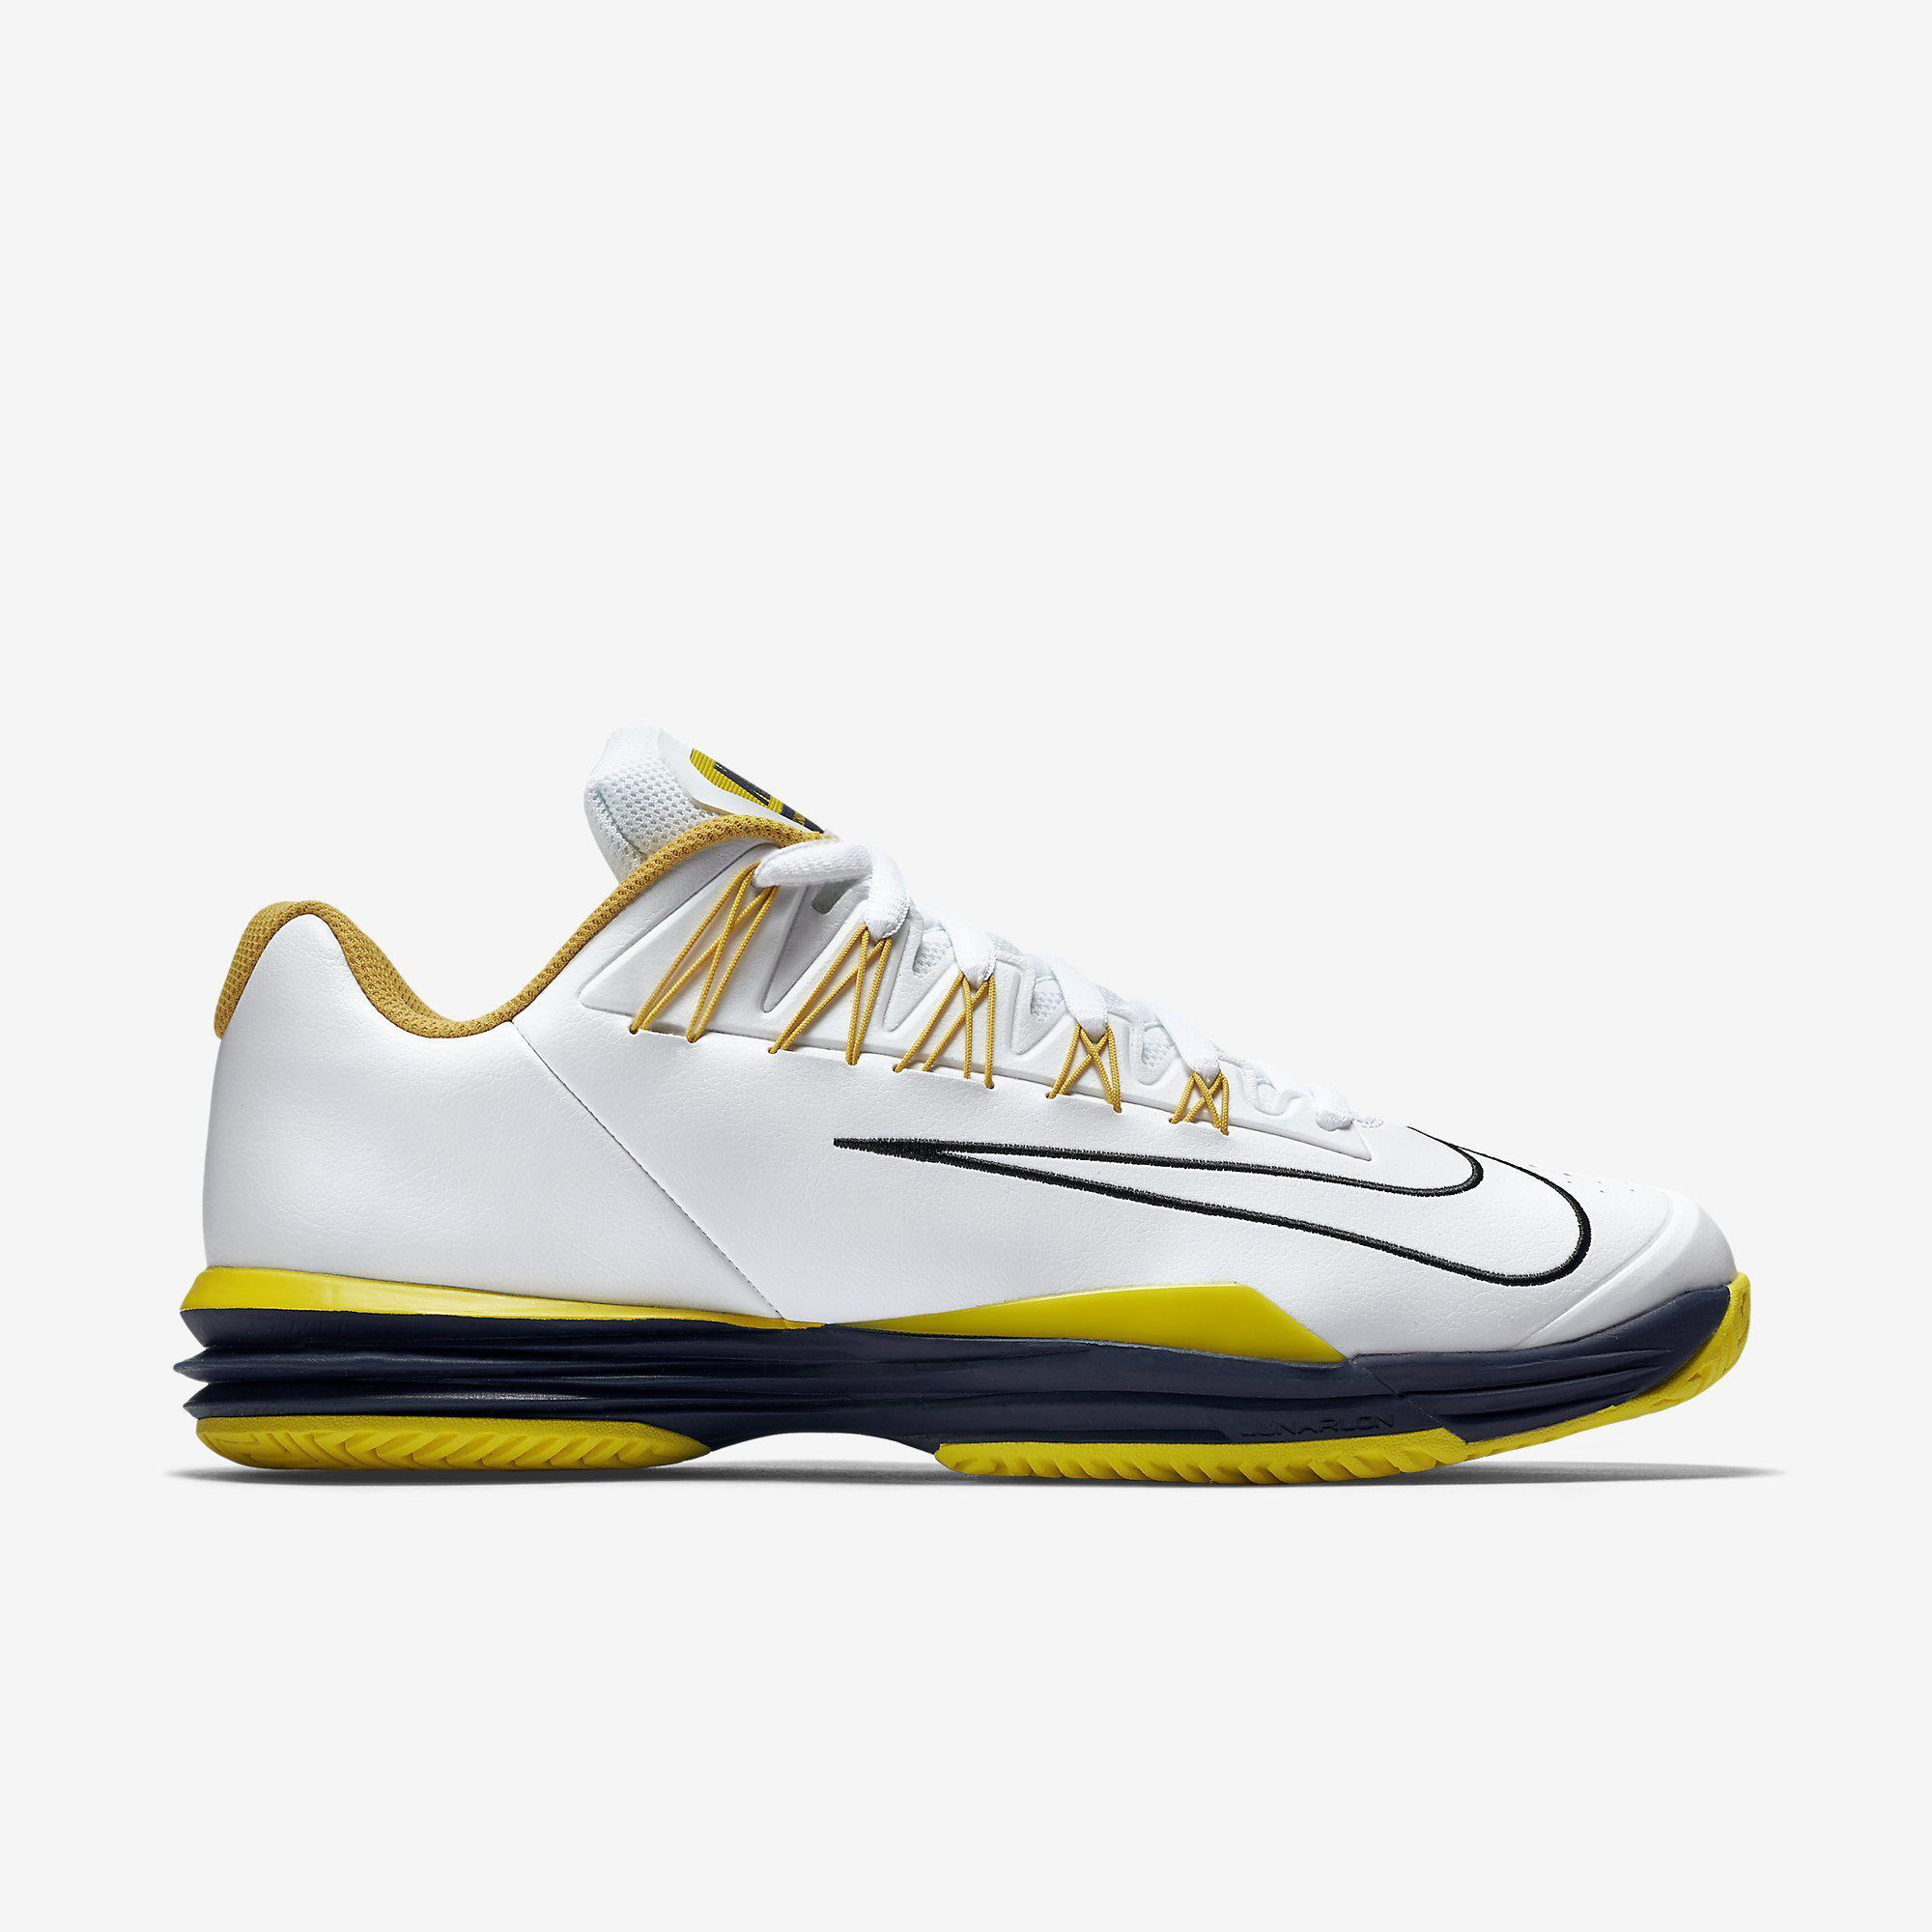 56e72d65956 Nike Mens Lunar Ballistec 1.5 Tennis Shoes - White Optical Yellow -  Tennisnuts.com